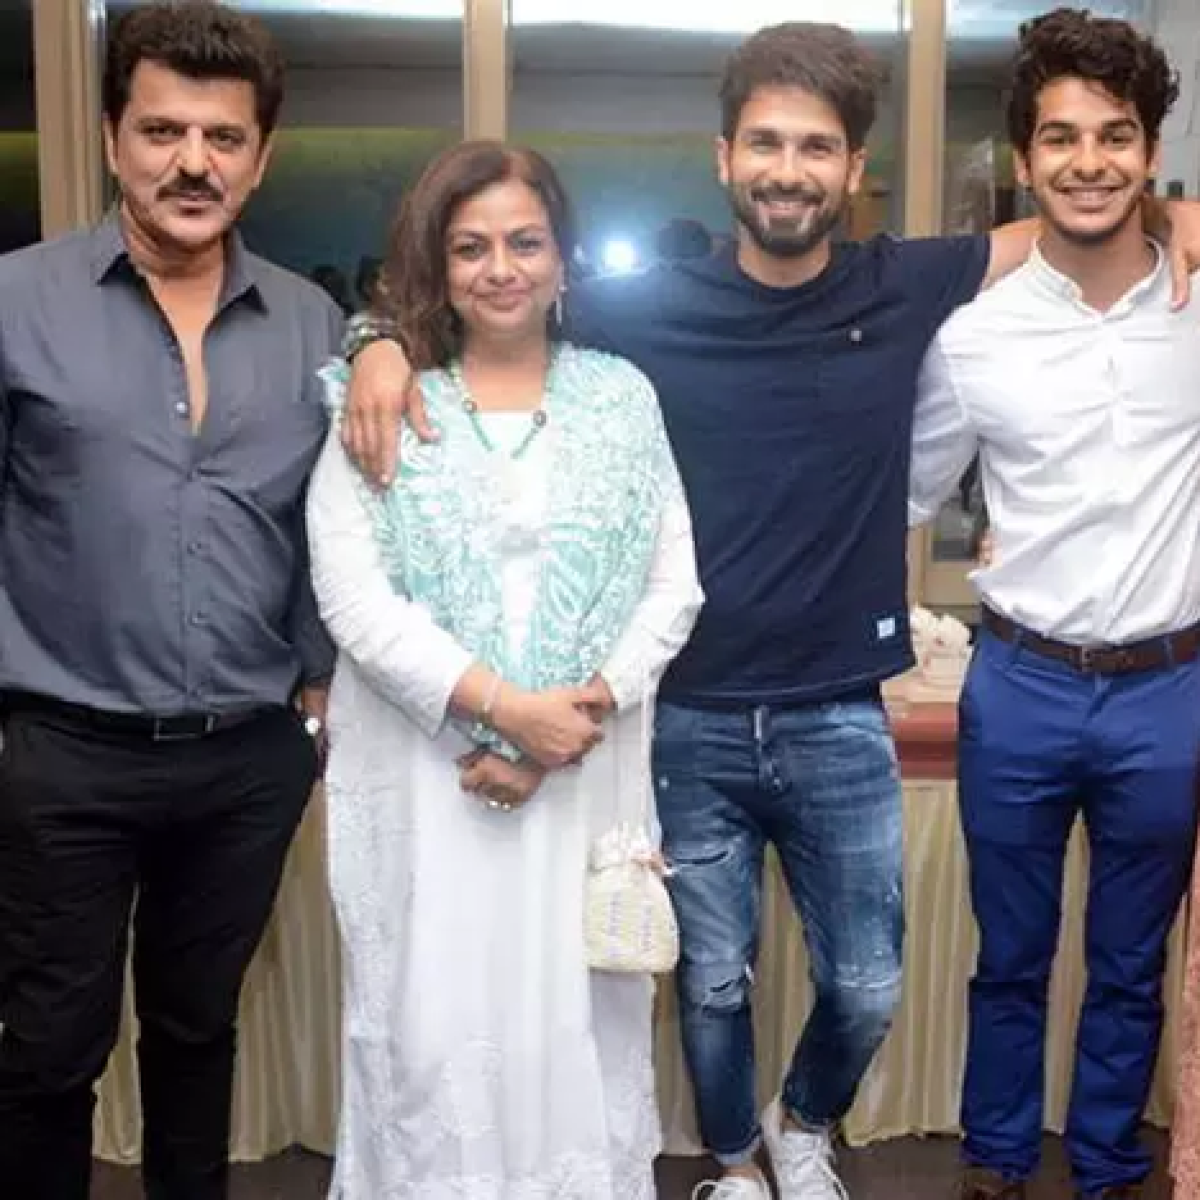 'First time I actually experienced grief': Shahid Kapoor's mom Neelima Azeem on her failed marriage with Pankaj Kapur